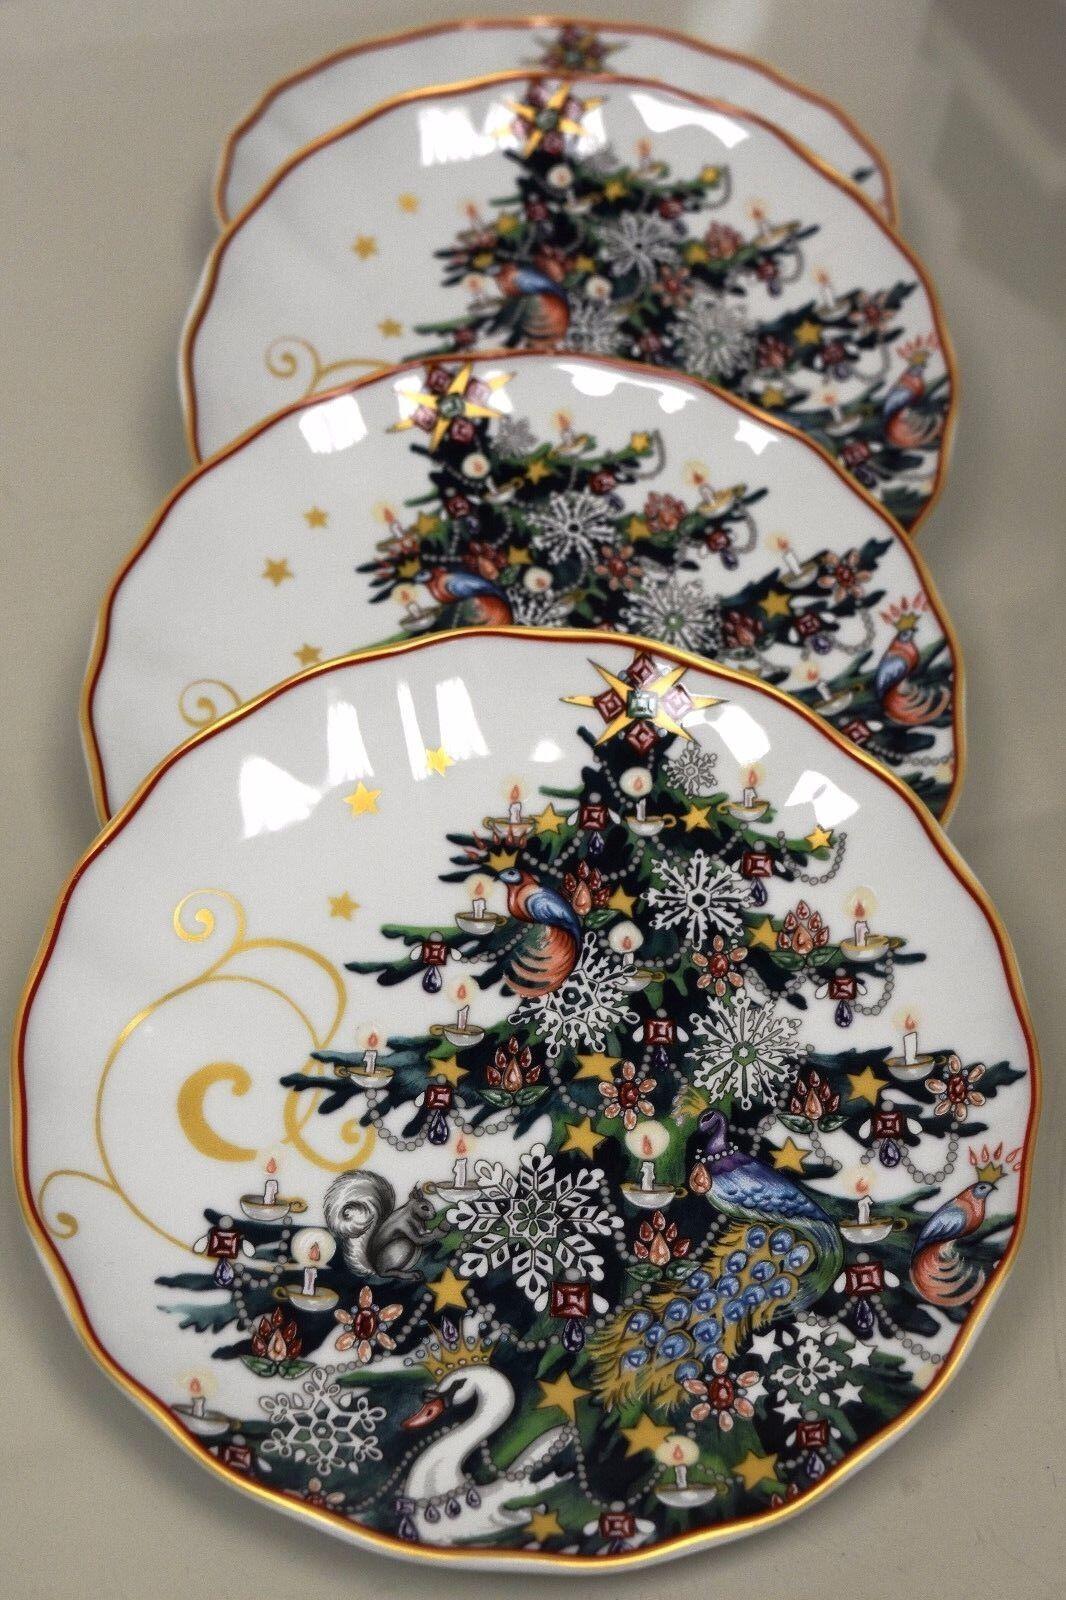 Nouveau TWAS THE NIGHT BEFORE CHRISTMAS Williams Sonoma Arbre assiettes à salade Lot de 4